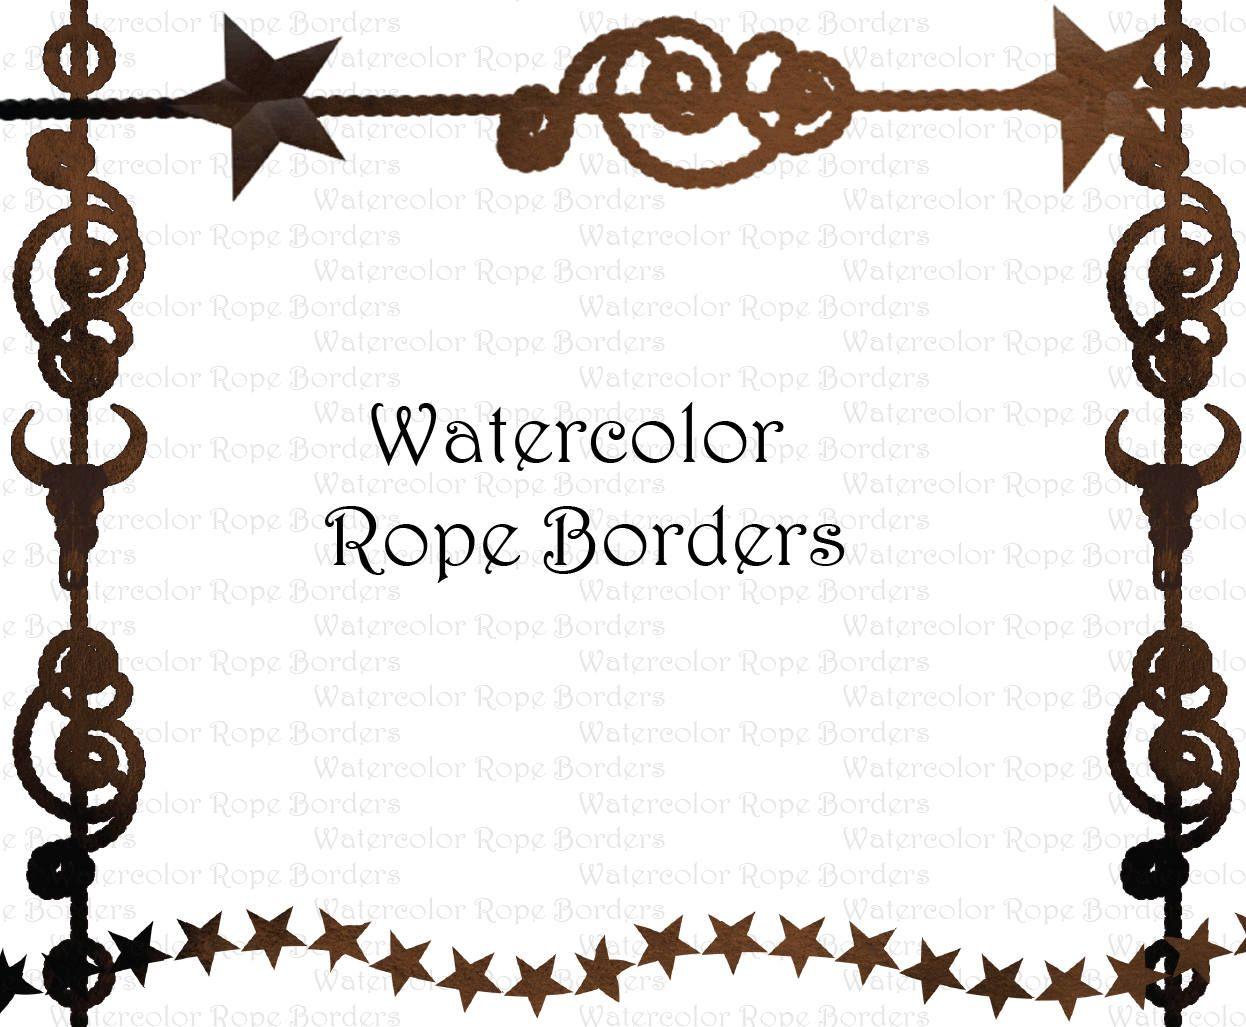 Watercolor Western Cowboy Rope Border Clipart Graphics High Etsy In 2020 Clip Art Borders Western Clip Art Digital Clip Art